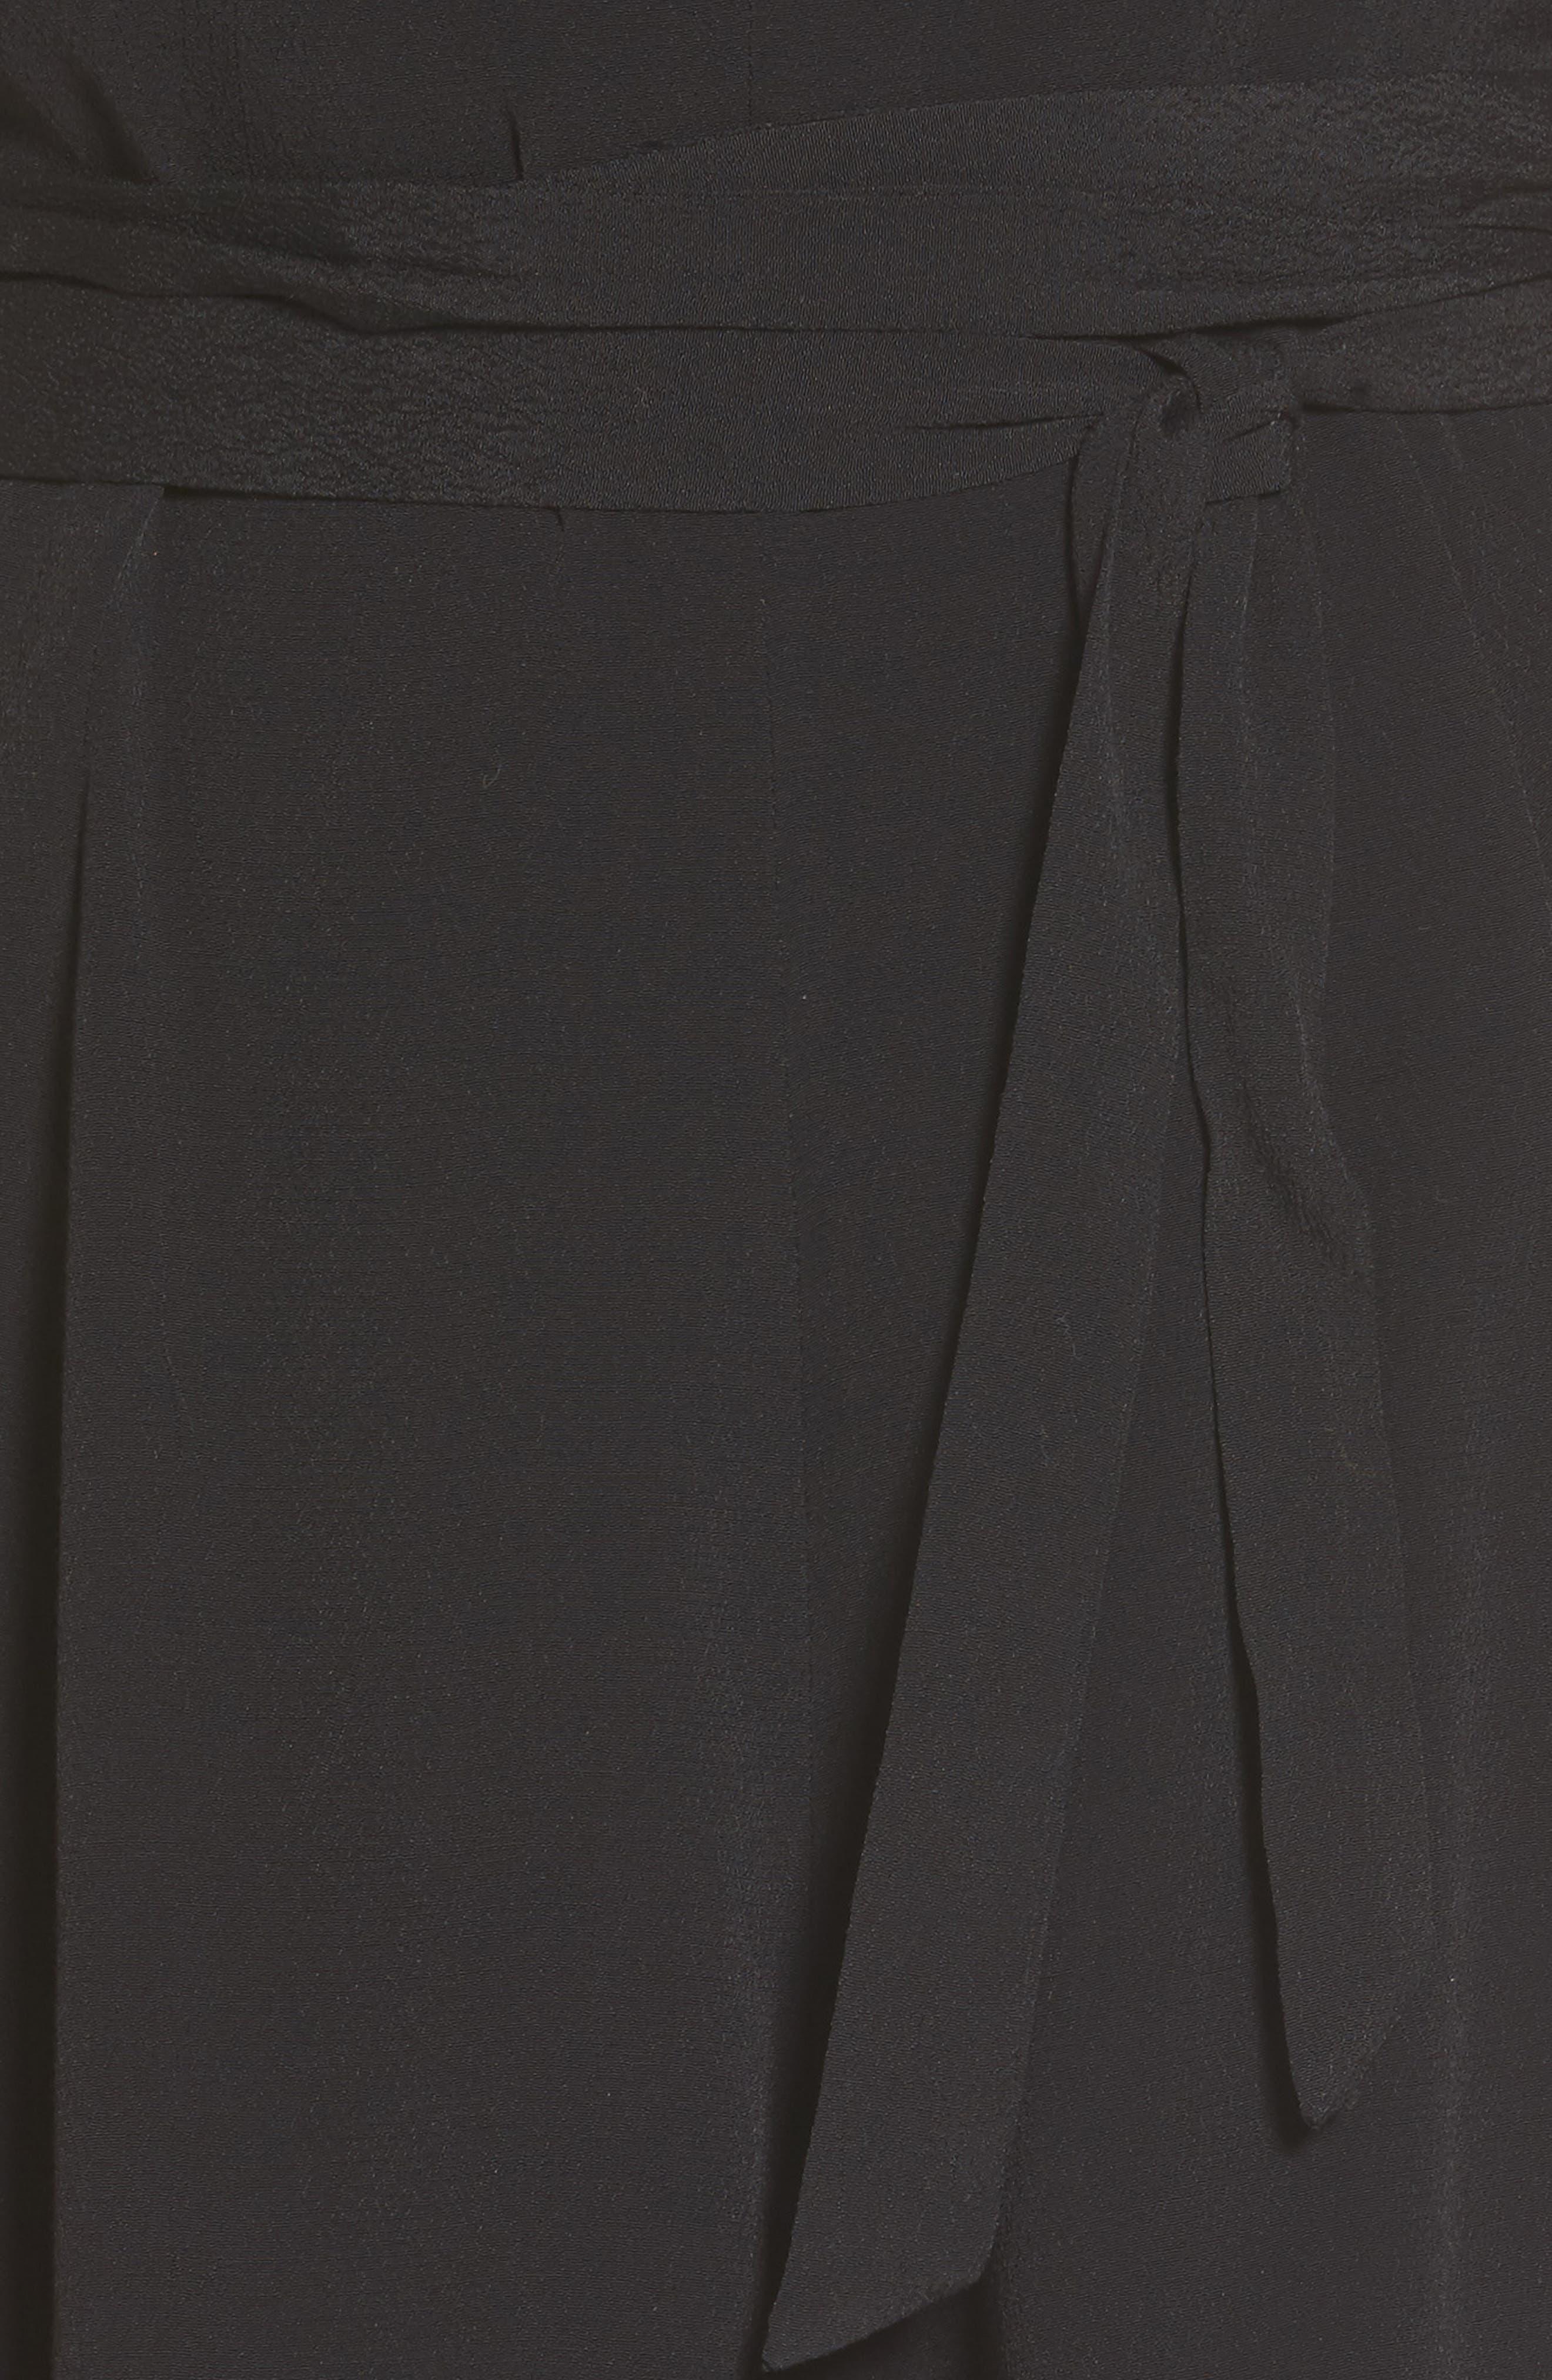 Deluth Off the Shoulder Dress,                             Alternate thumbnail 9, color,